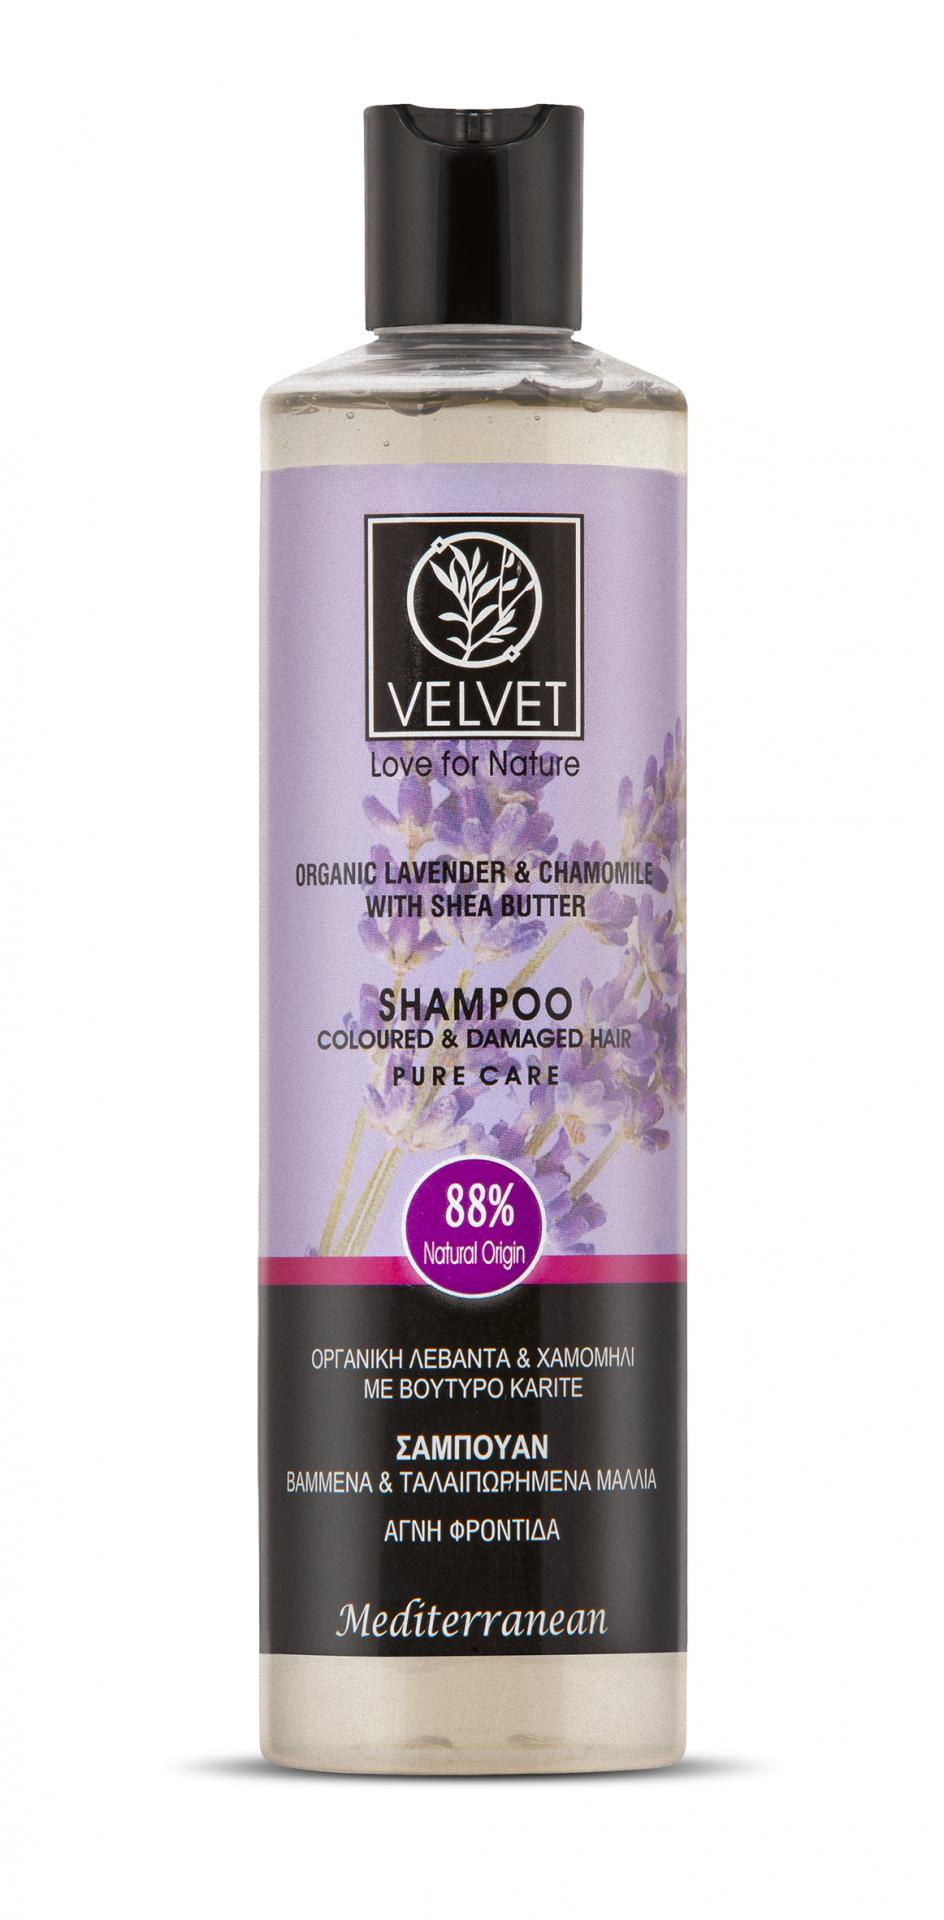 Champú Velvet de Lavanda, Manzanilla y Karité para cabello teñido y dañado  300 ml